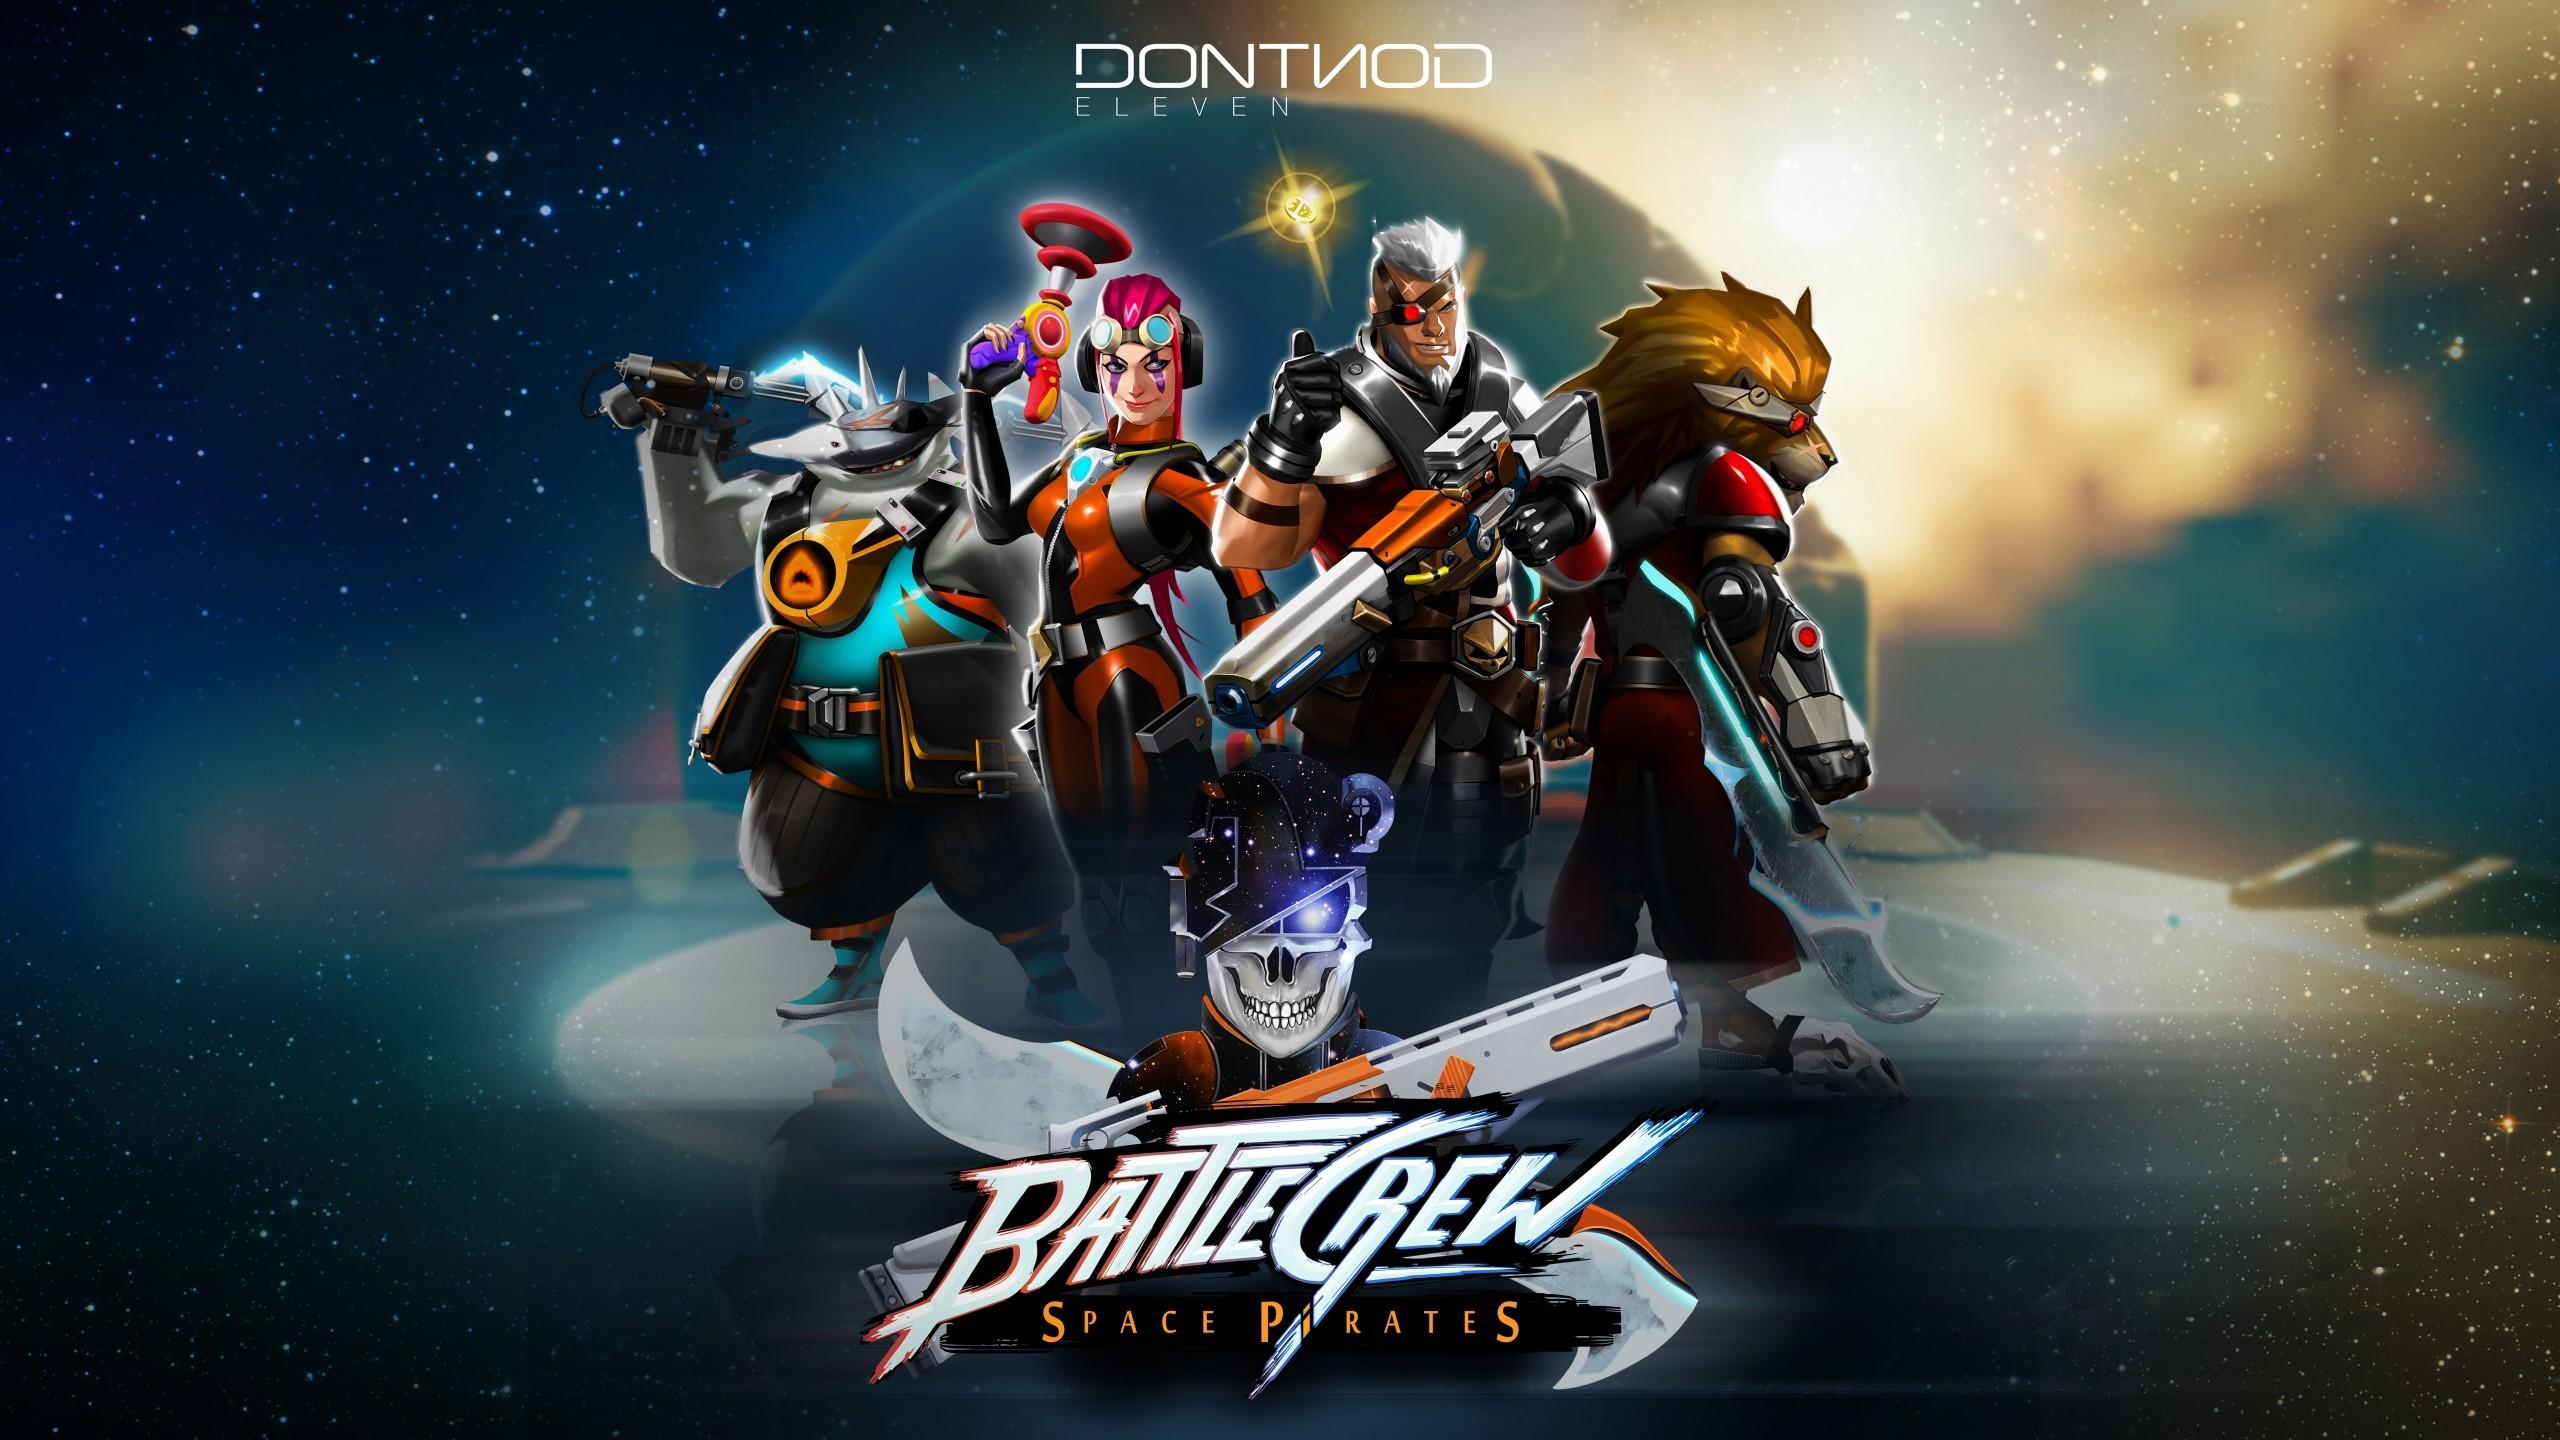 Games / Battlecrew: Space Pirates Wallpaper